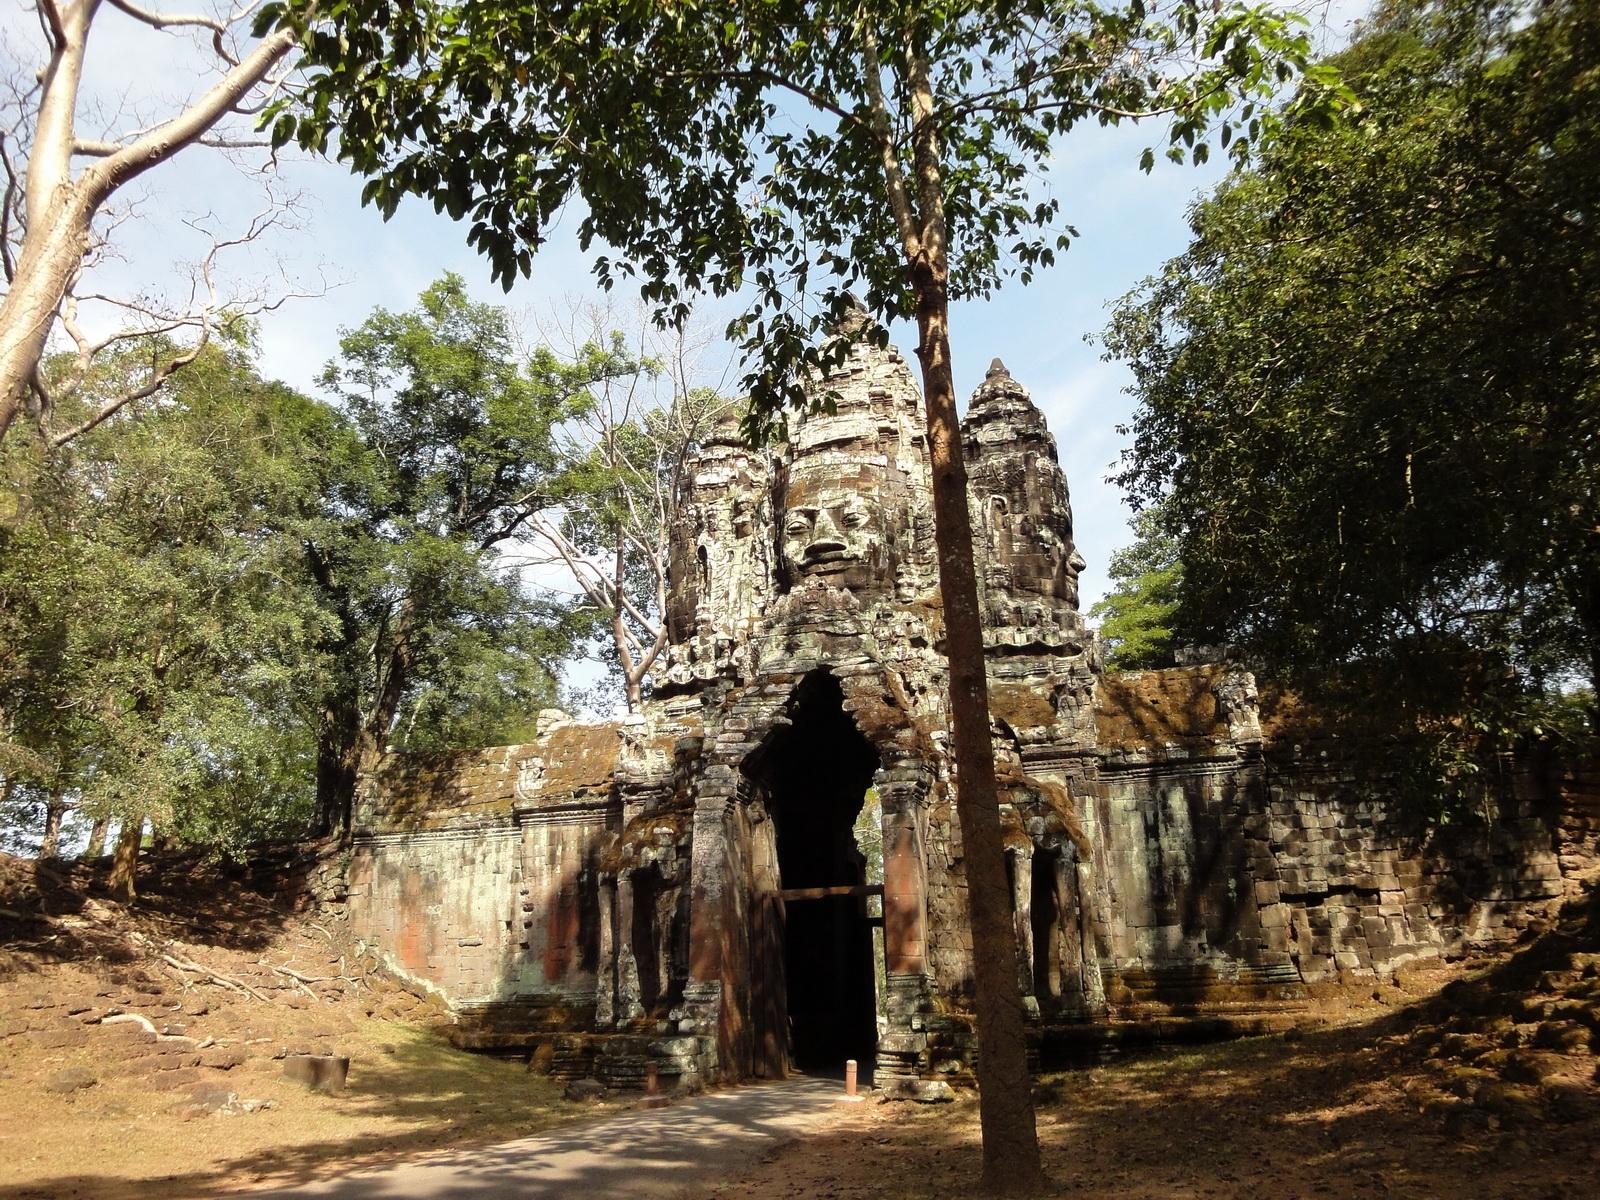 Angkor Wat style architecture North Gate Jan 2010 03